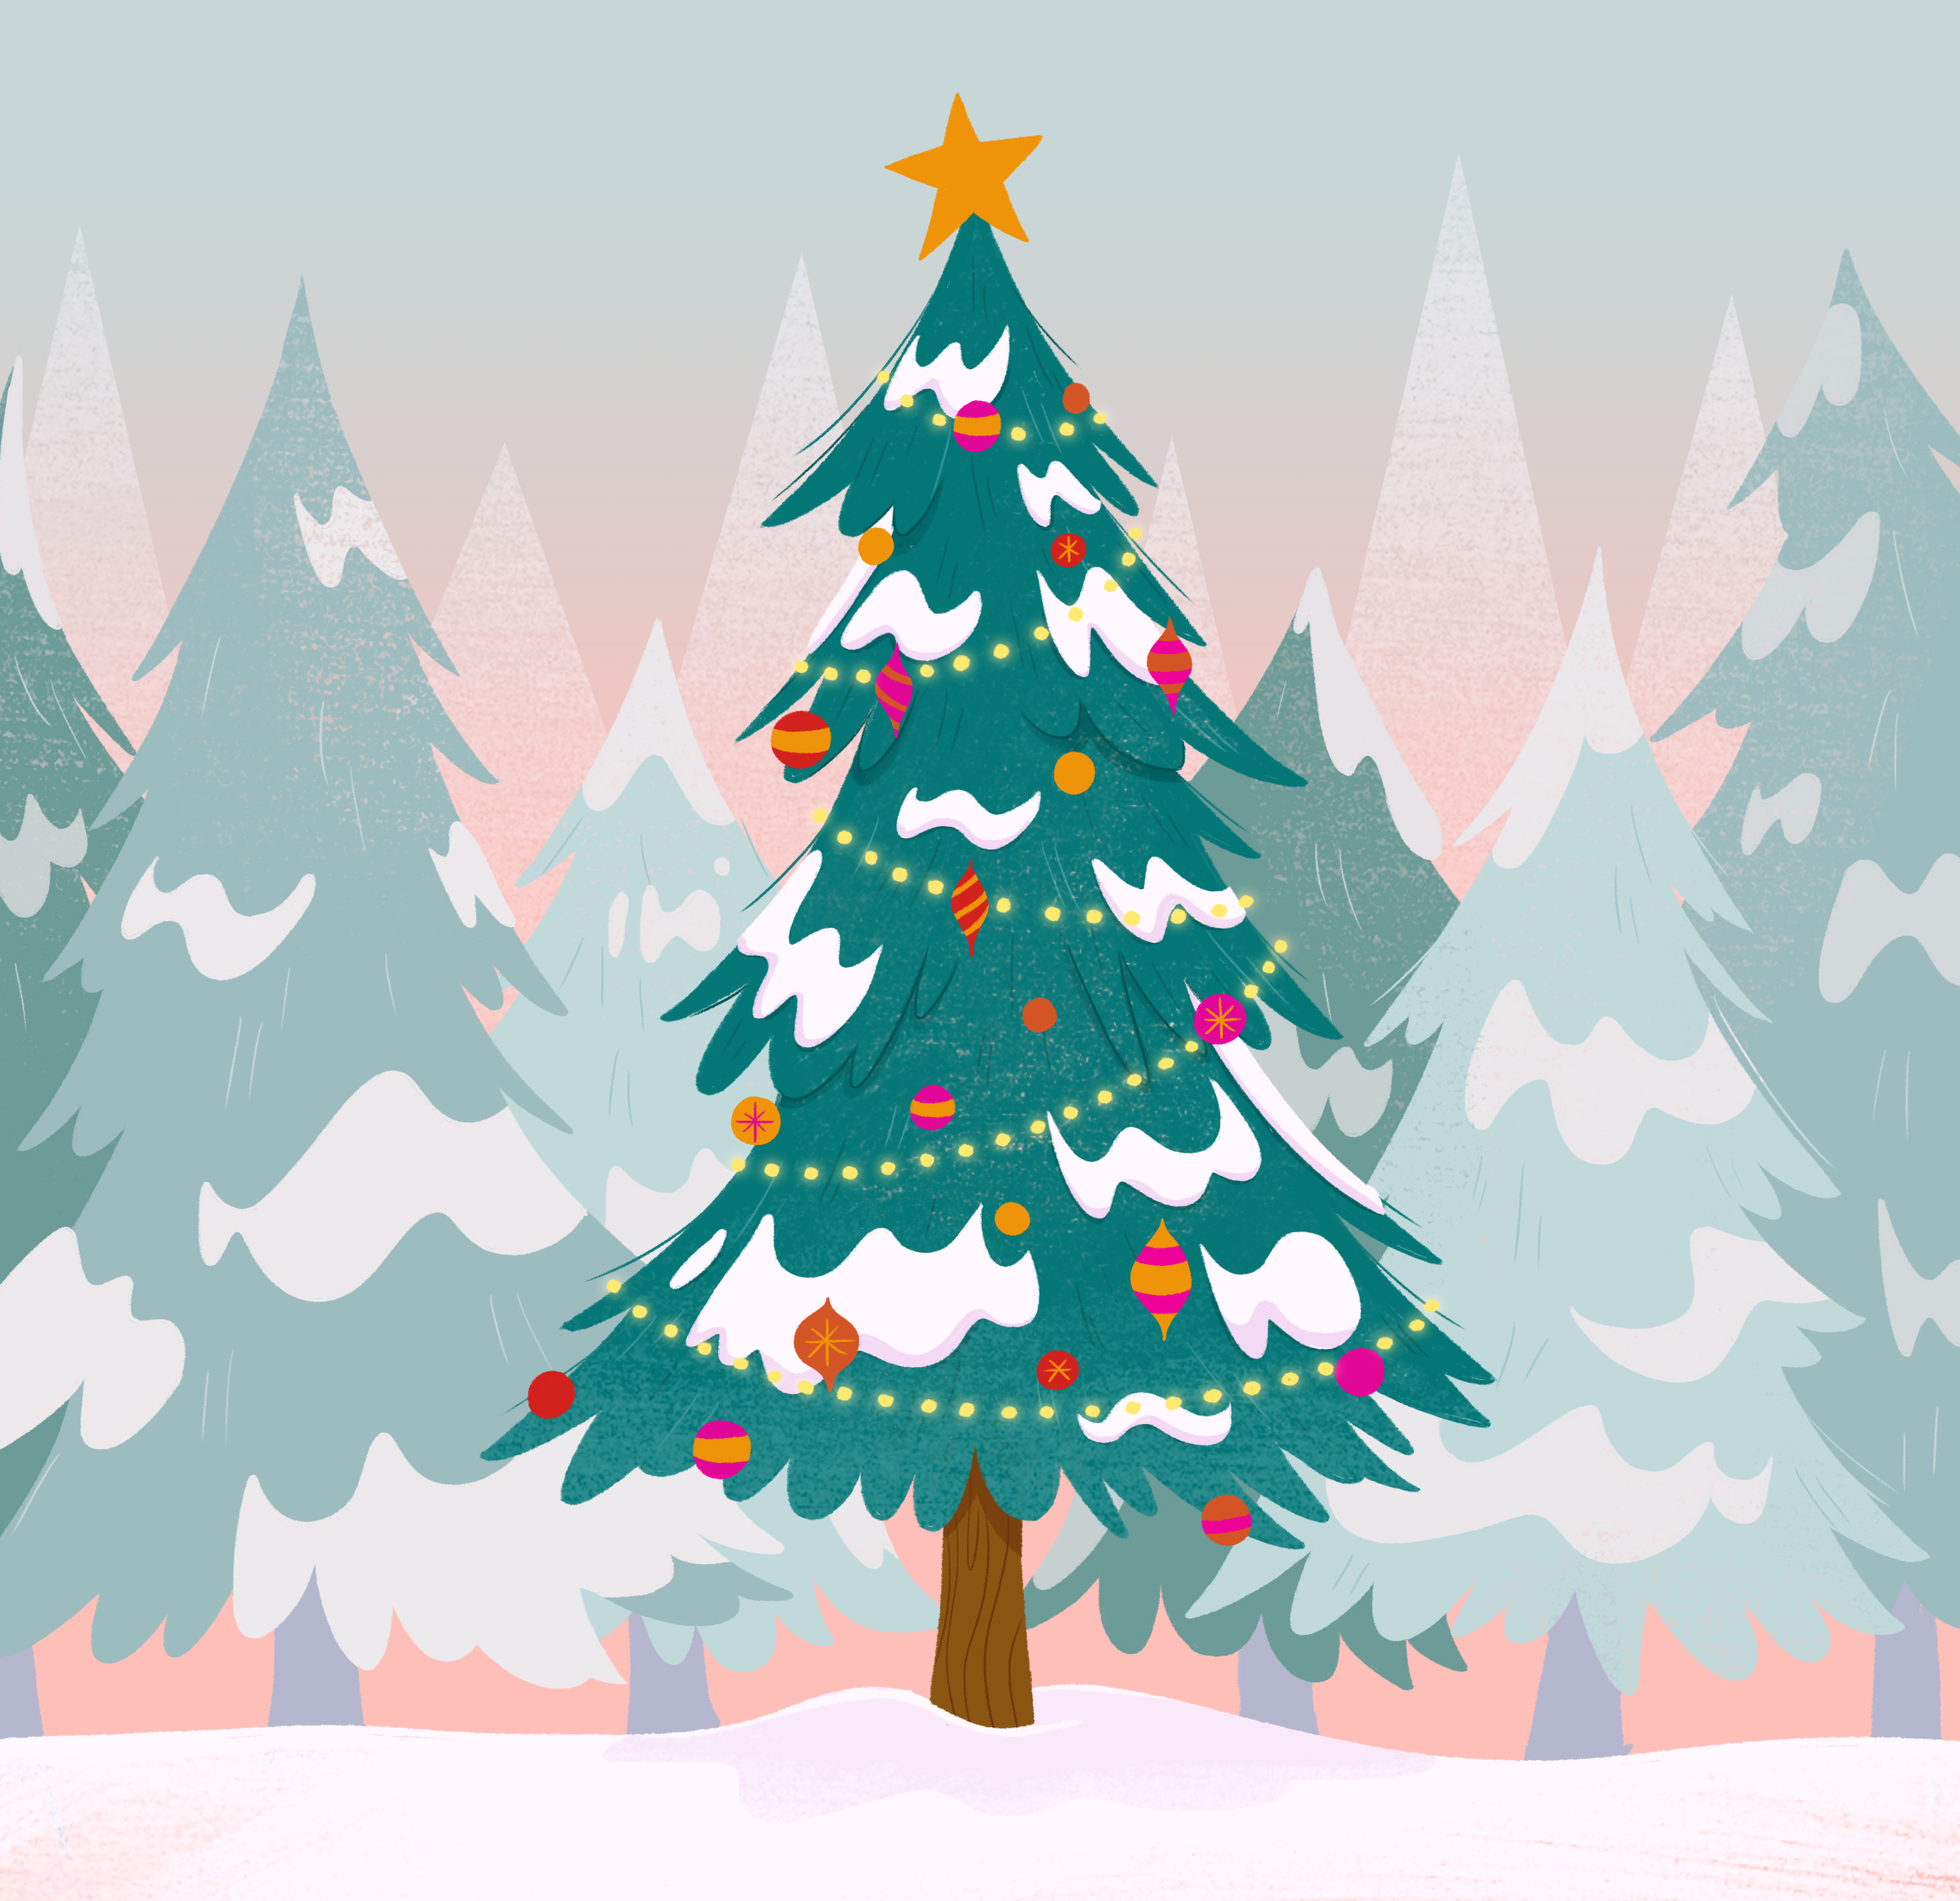 Day 7 Christmas Tree.jpg